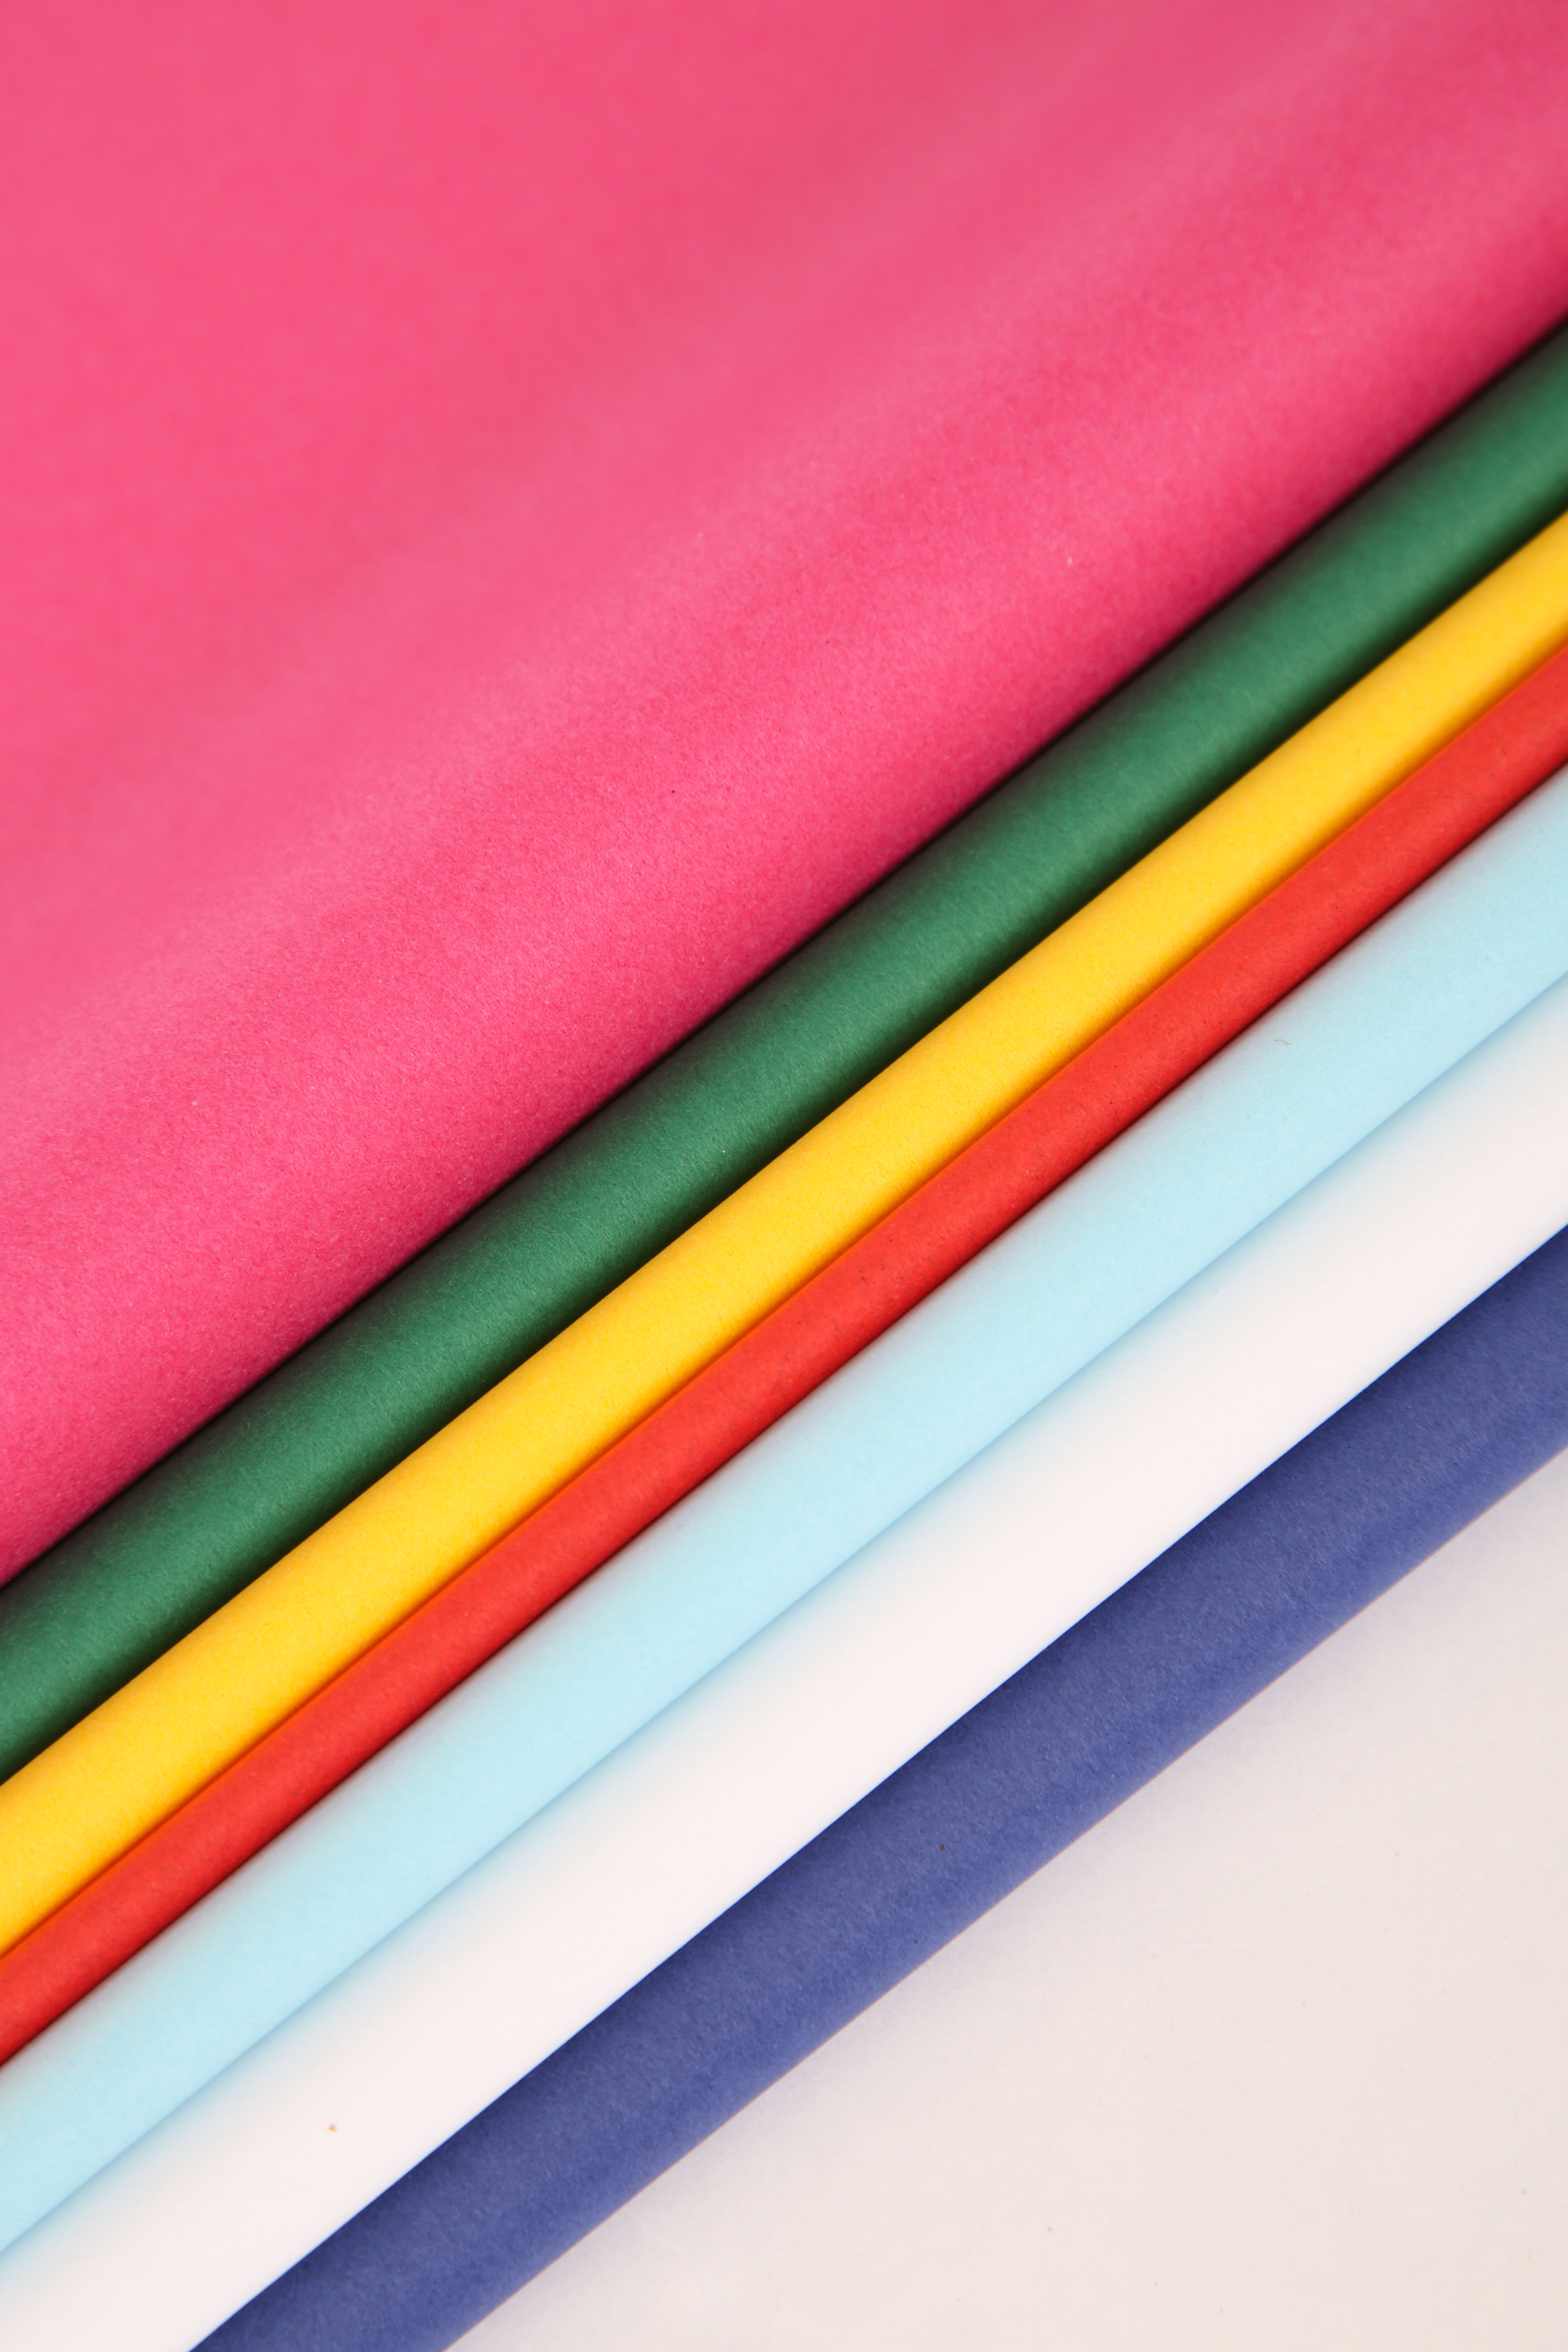 Tissue Paper Range